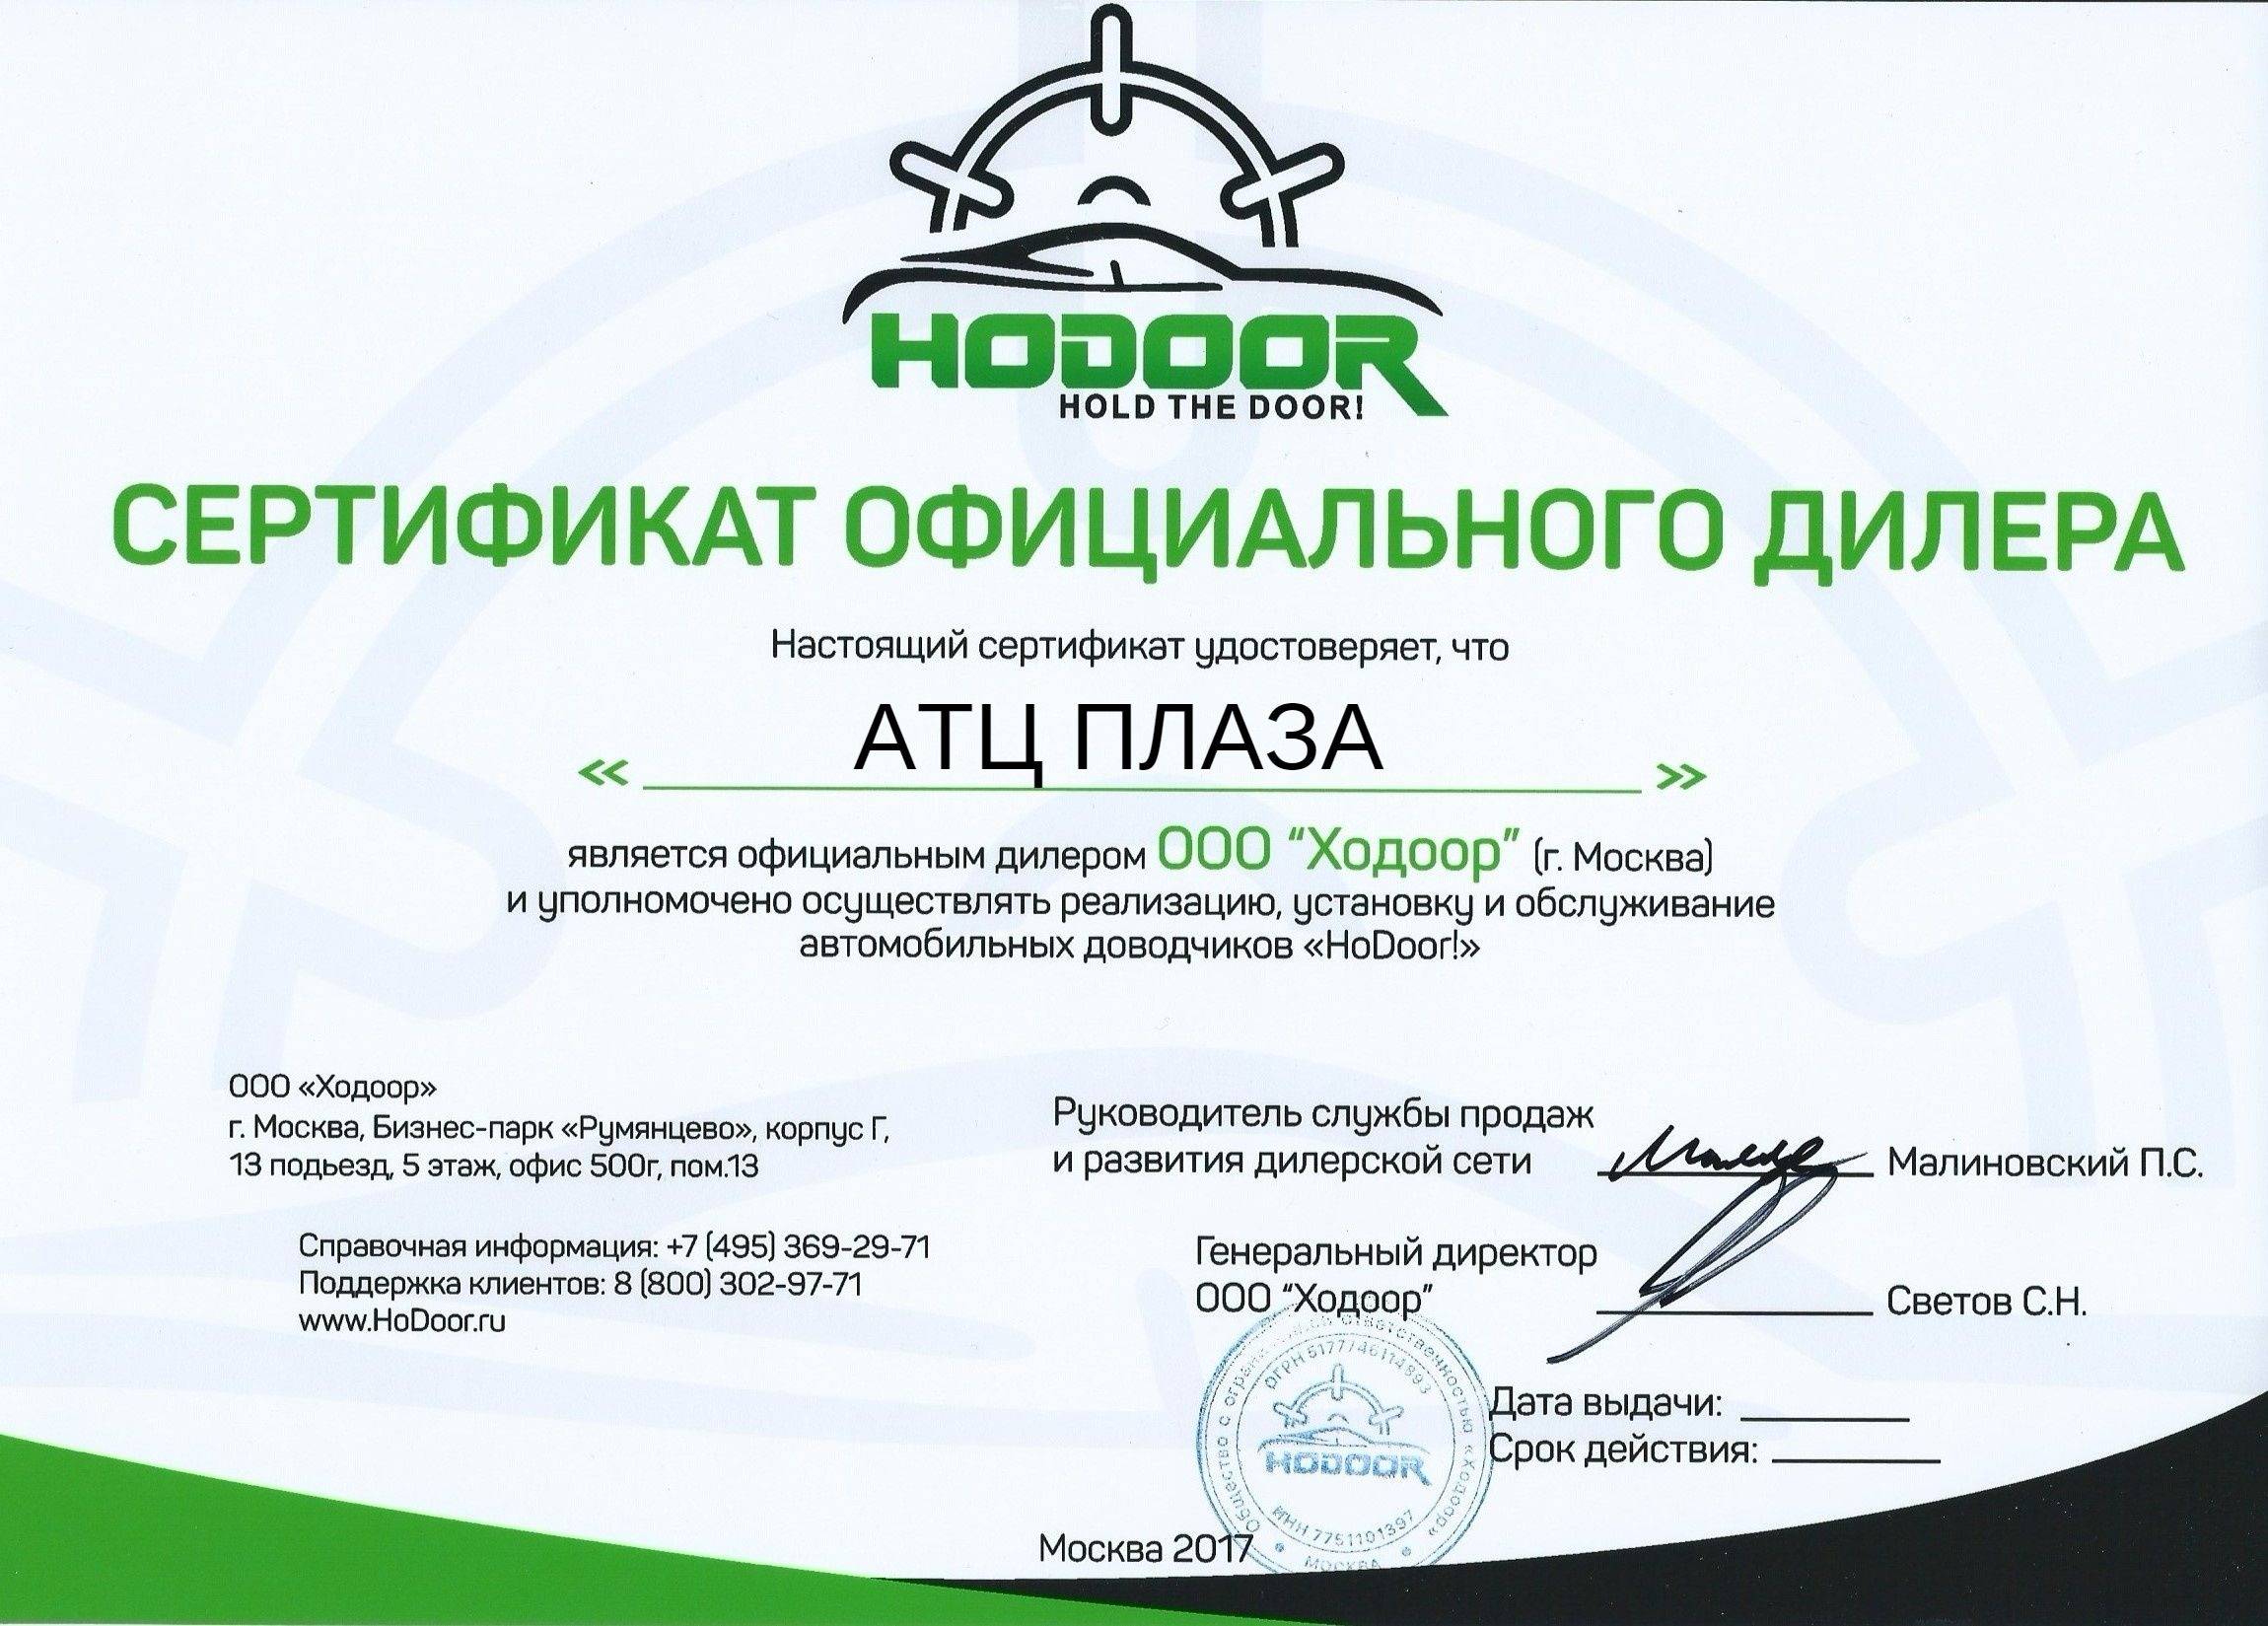 Сертификат дилера Hodoor